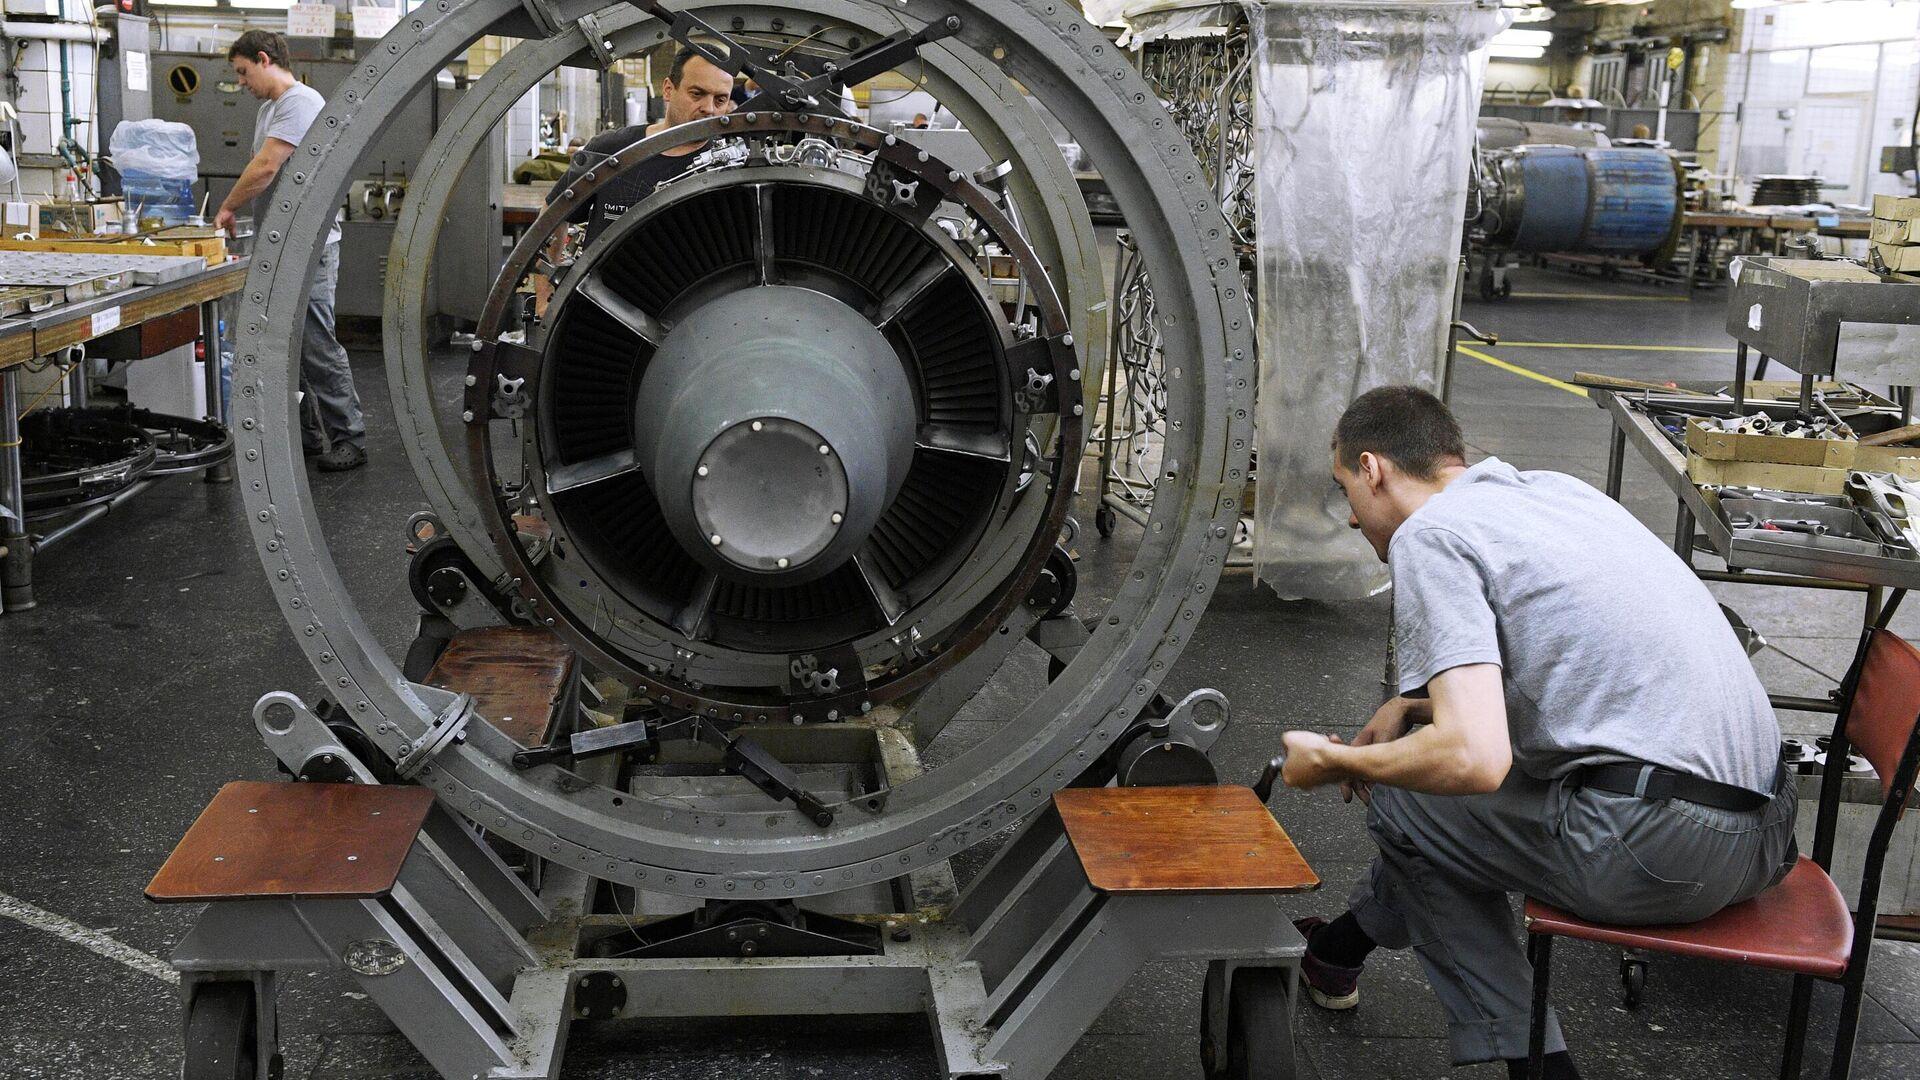 Производство авиадвигателей на ММП имени В. В. Чернышёва - РИА Новости, 1920, 24.06.2021